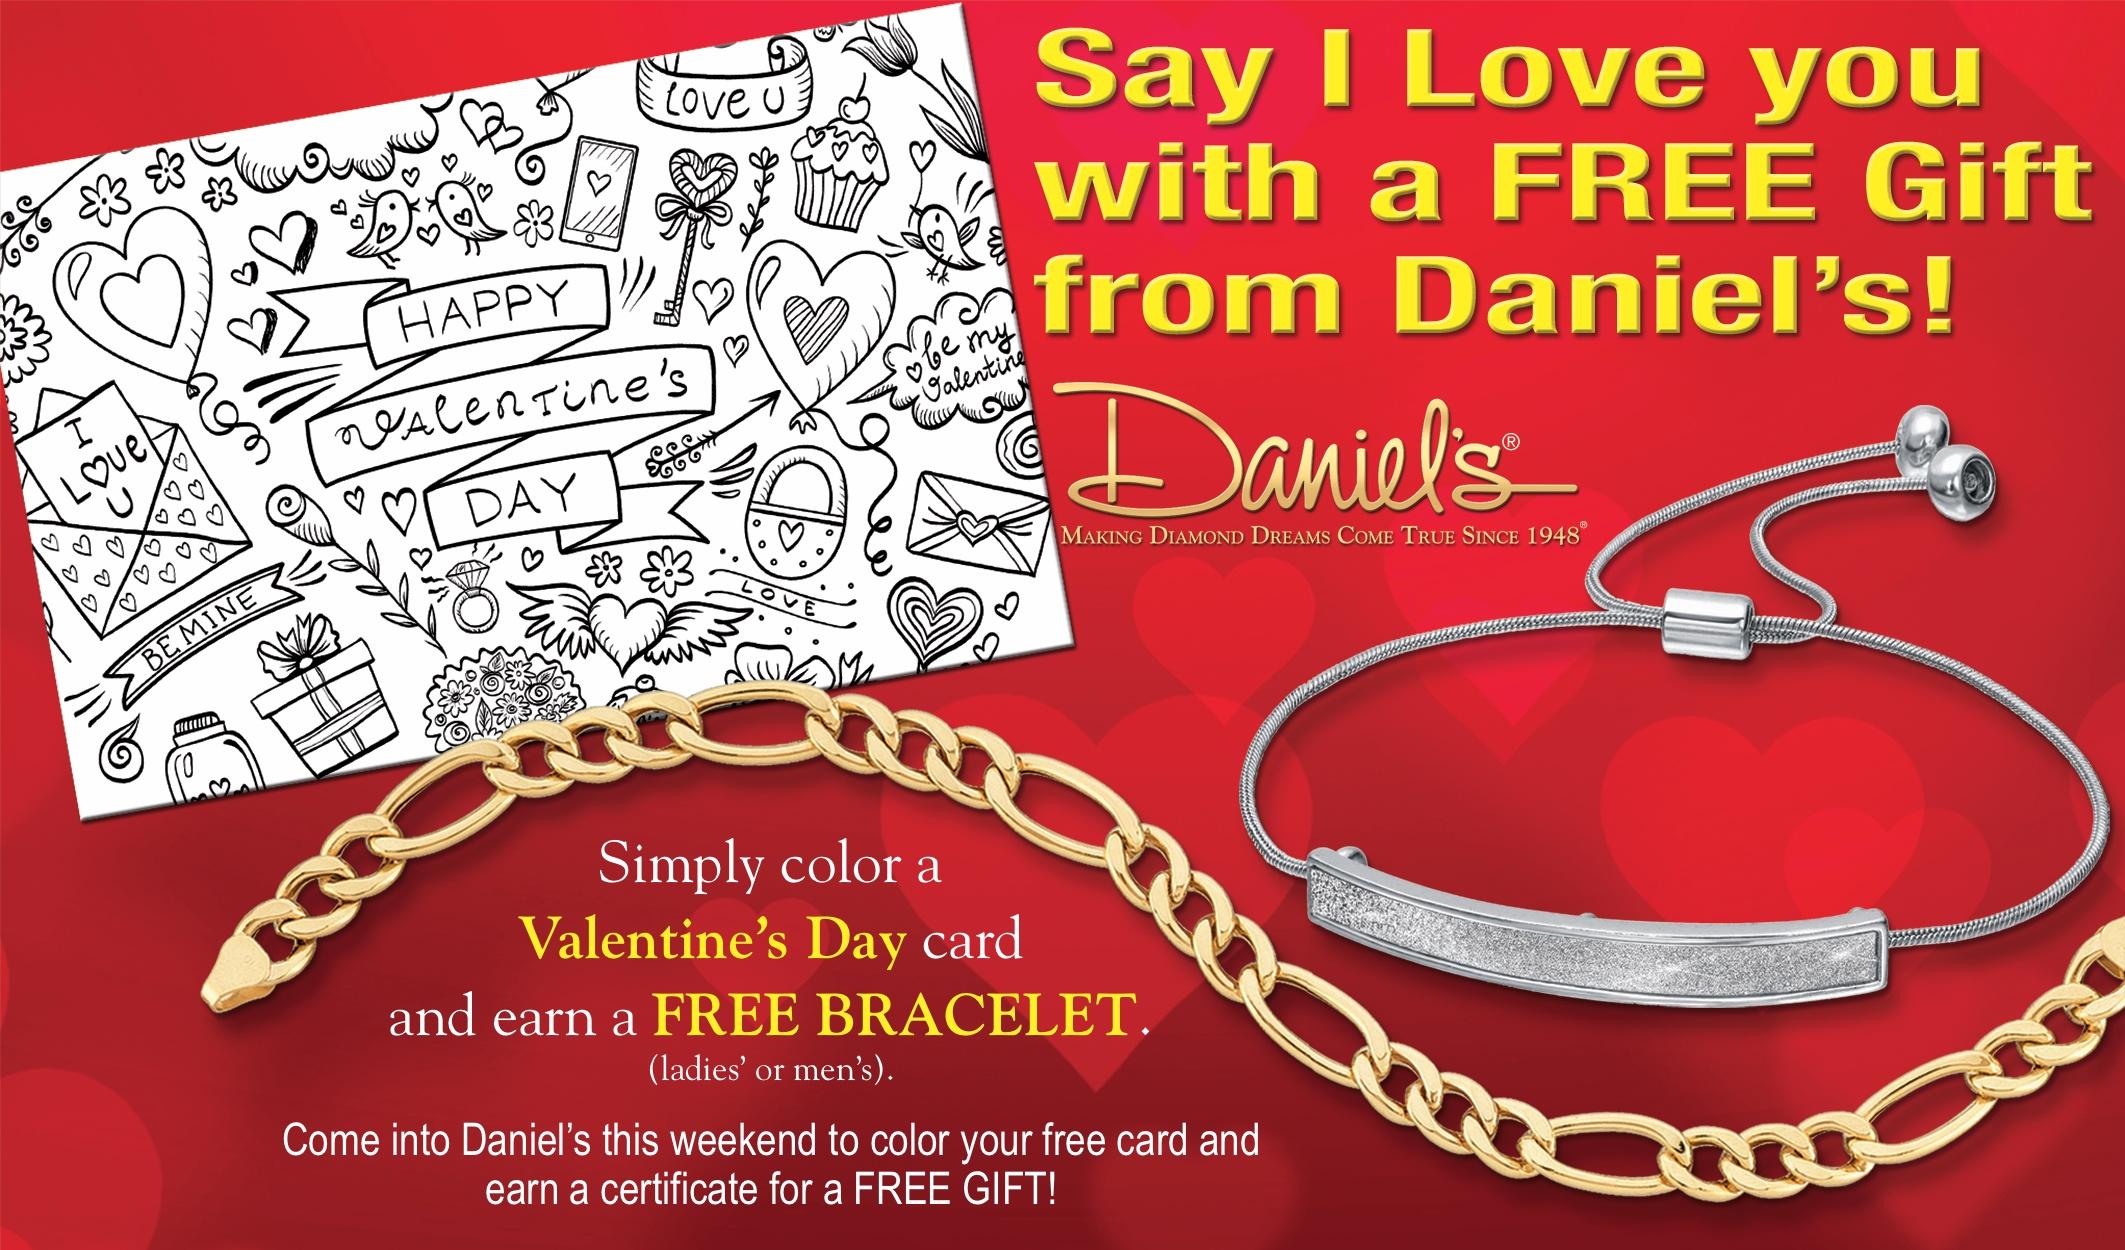 Daniel's Jewelers VALENTINE'S CARD & FREE GIFT